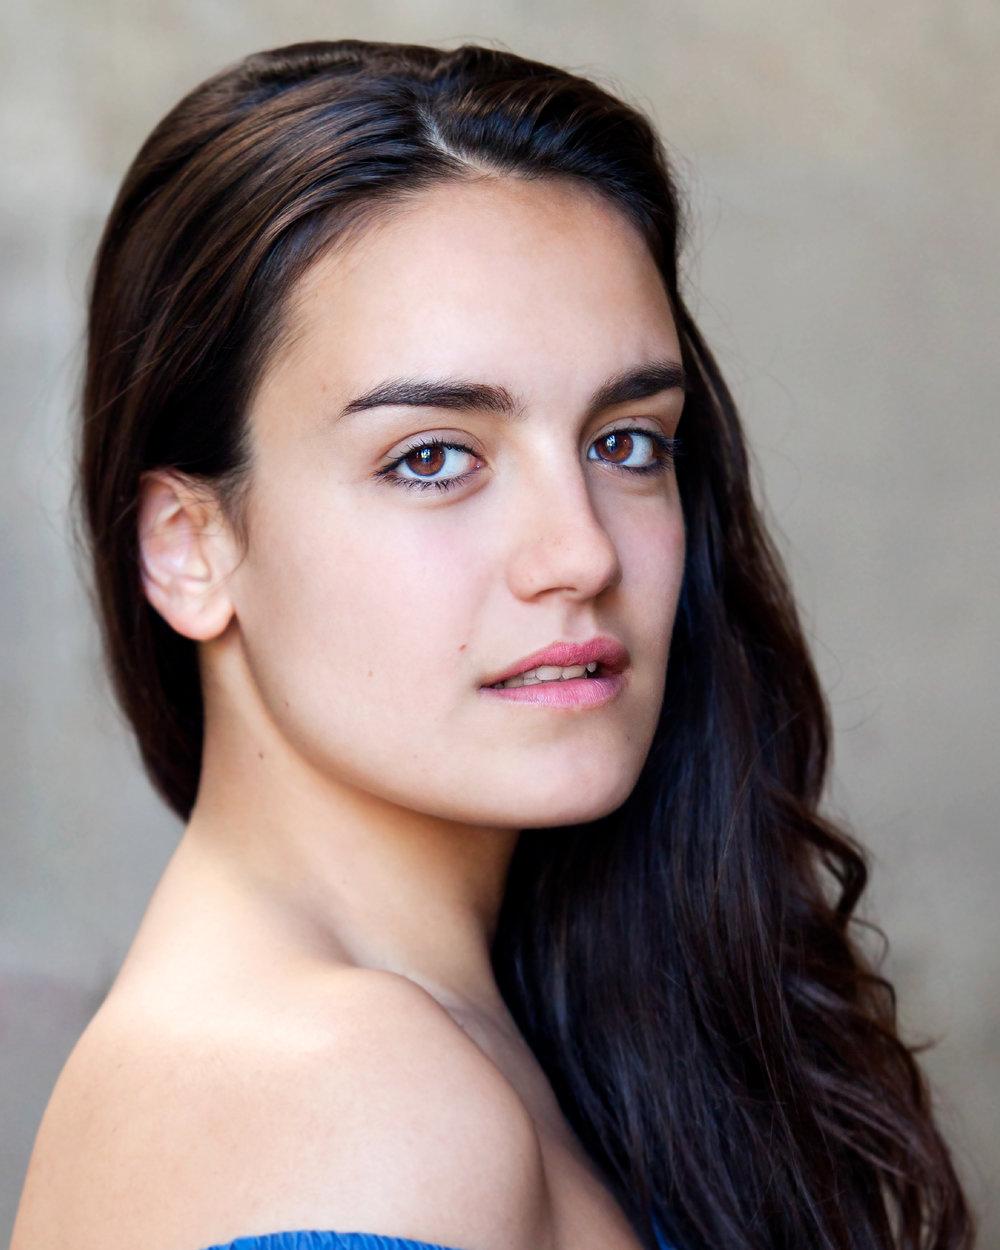 "<a href=""http://iabstudentprofiles.com/camila-piccinini"">Camila Piccinini</a>"